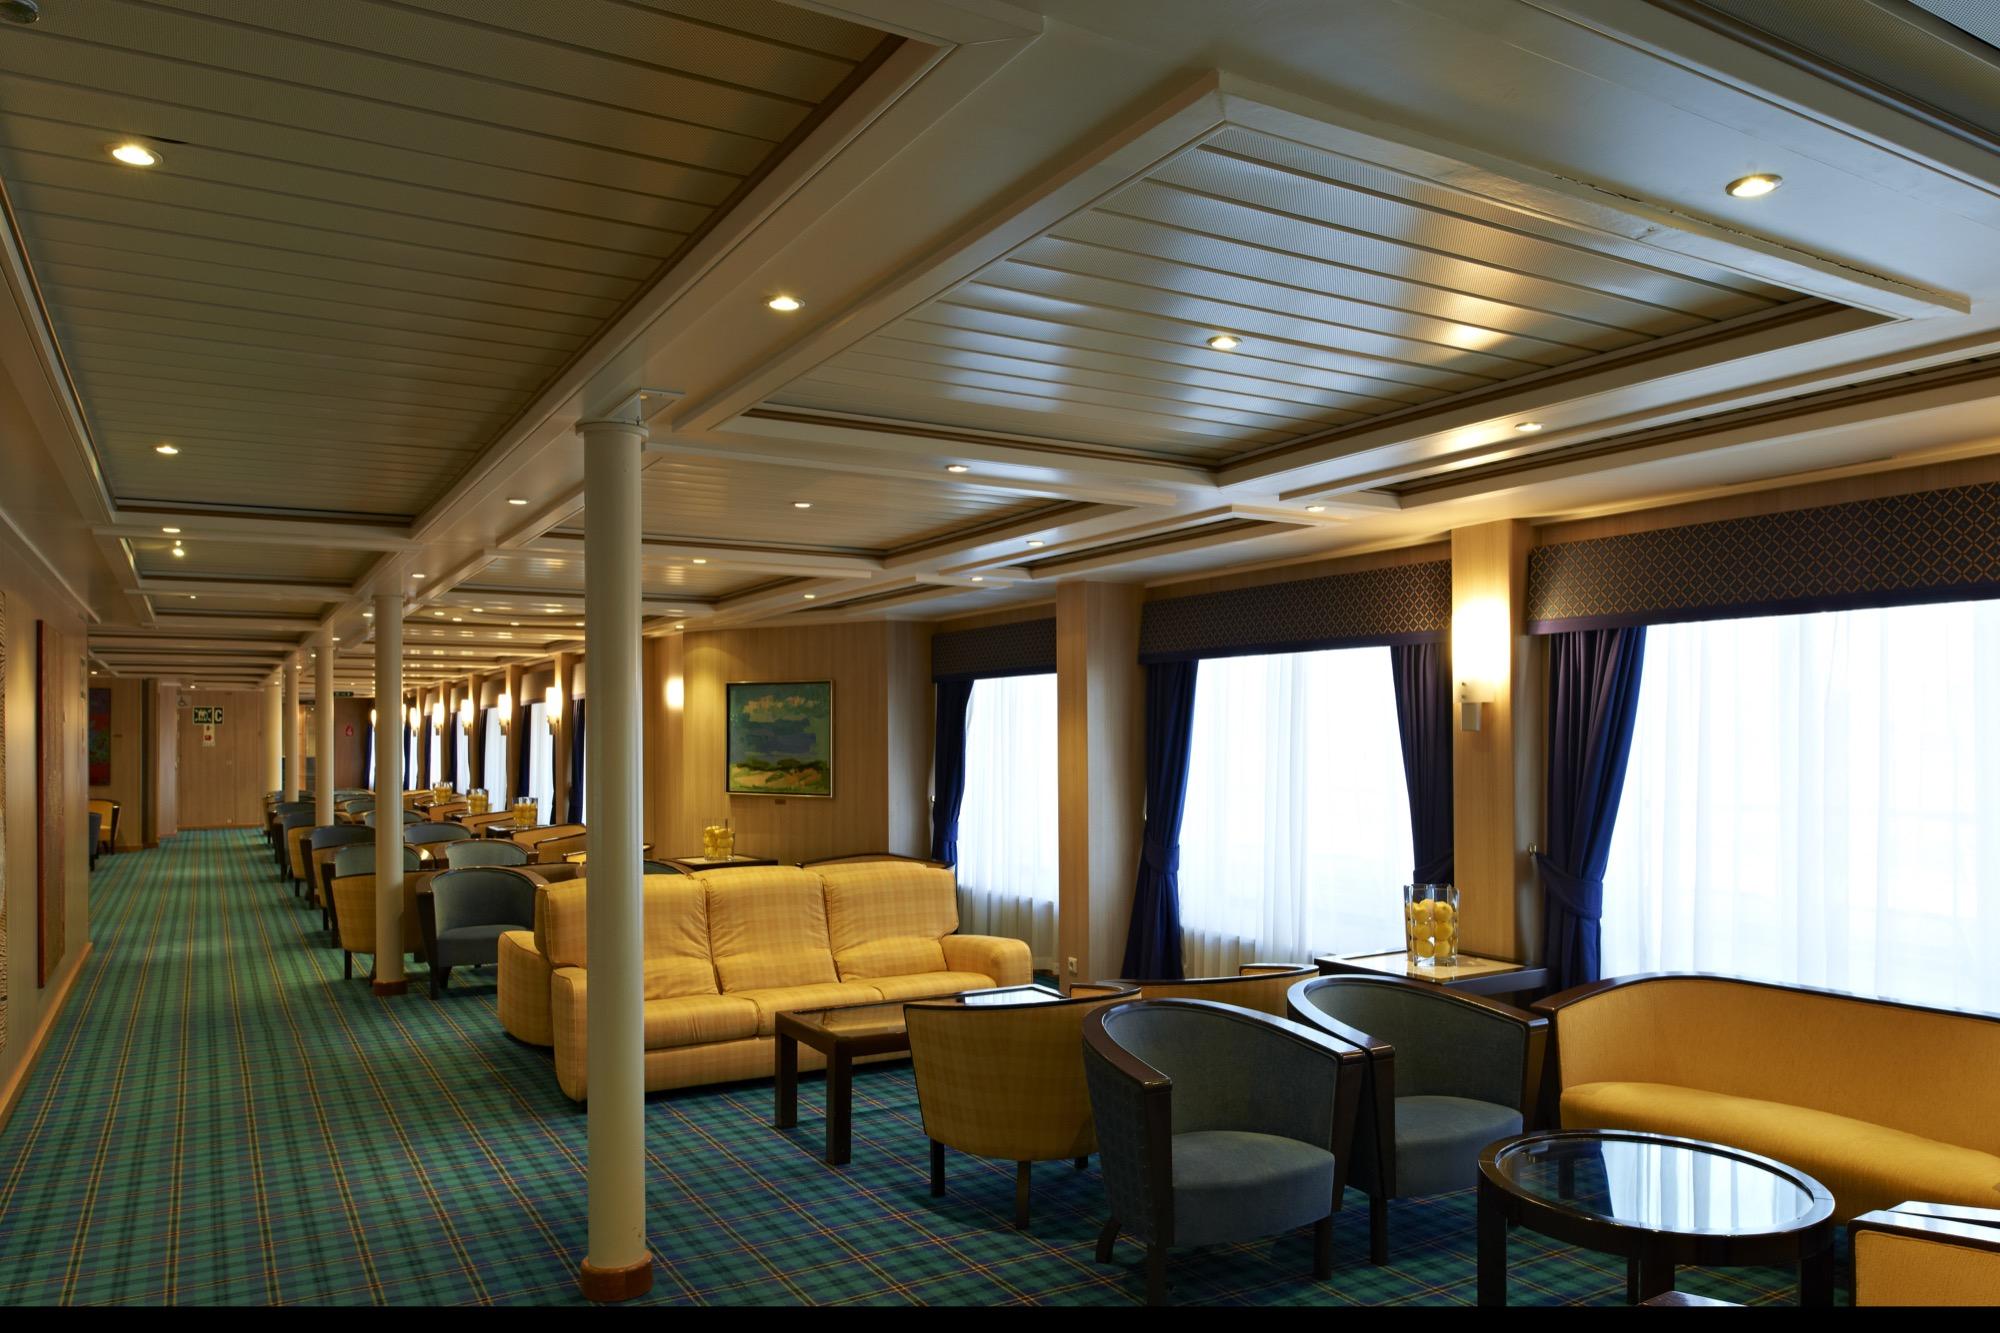 Fred Olsen Cruise Line Braemar Interior Braemar Room.jpg